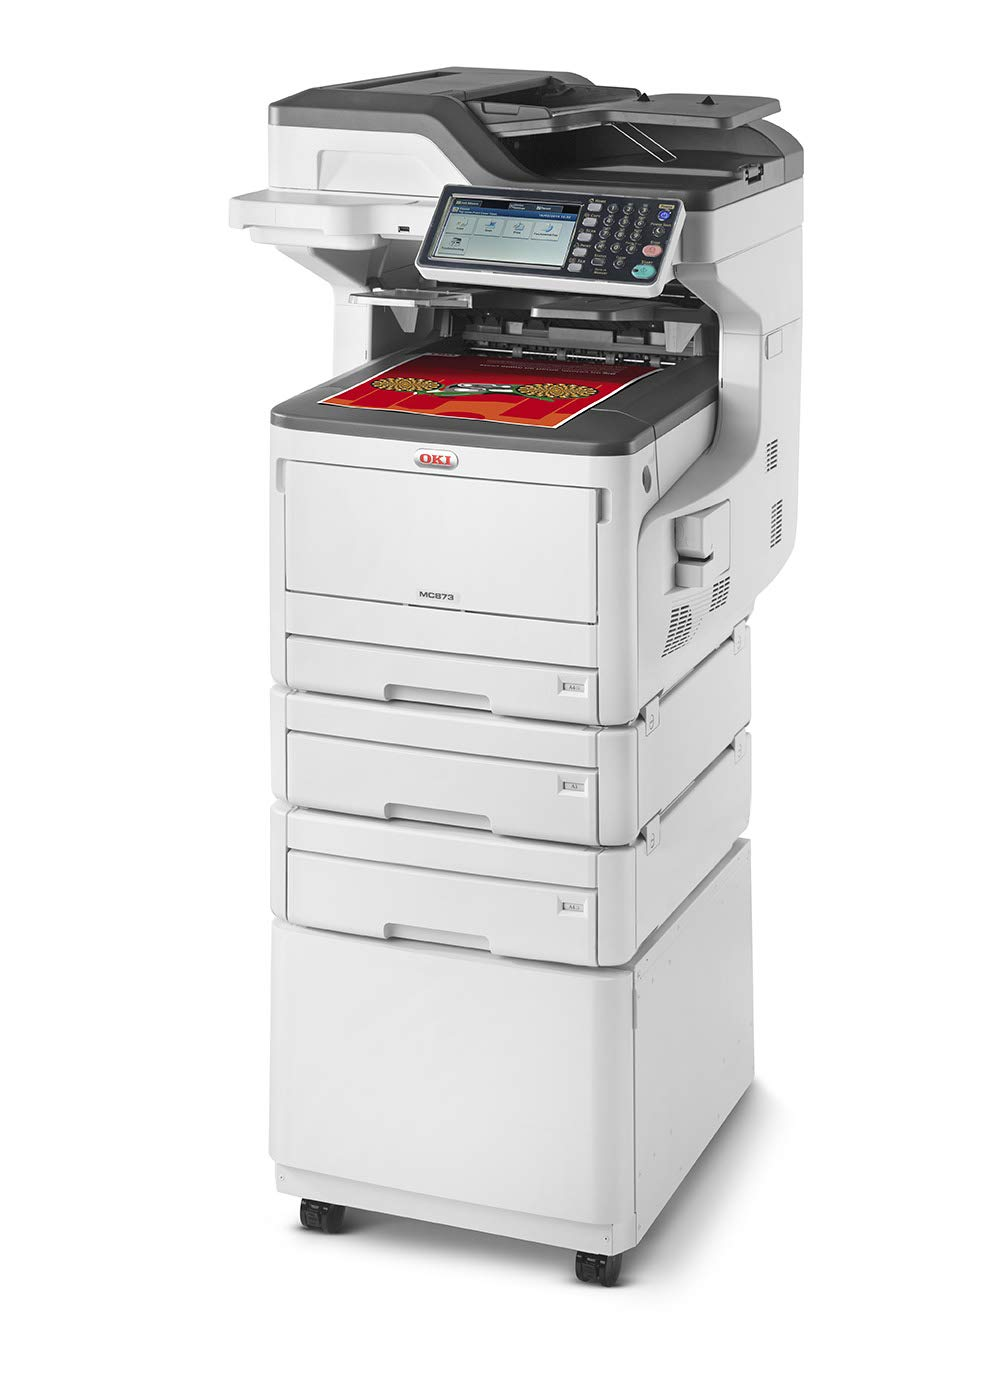 OKI MC873dnct MFP Drucker Duplex A3/ A4 Print Scan Copy fax 45850621